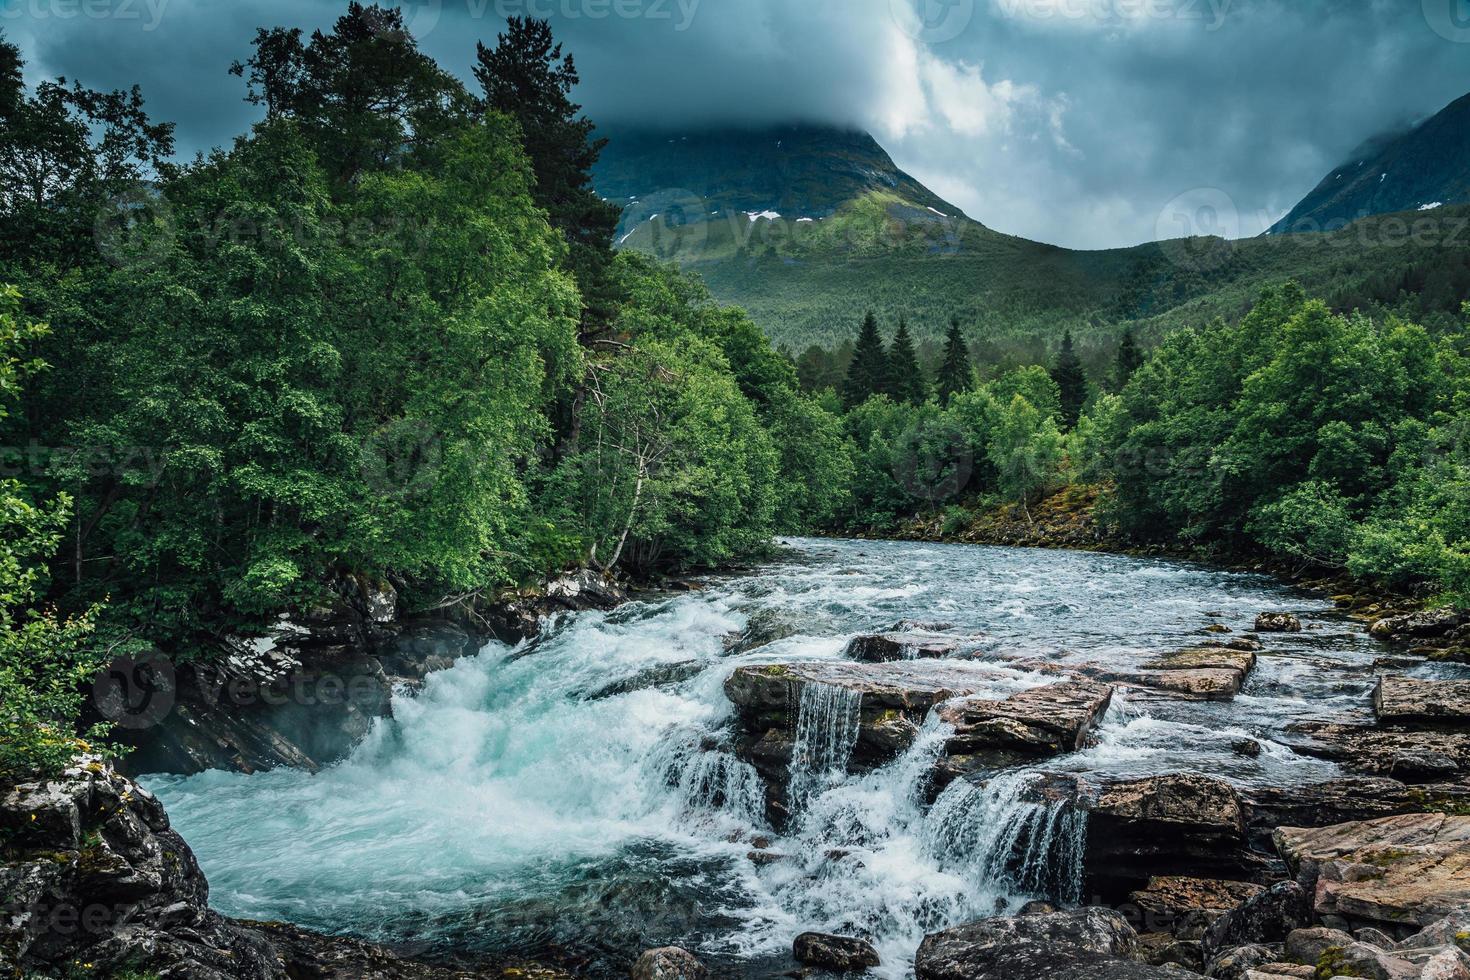 rivier in noorwegen die langs een berghelling stroomt foto